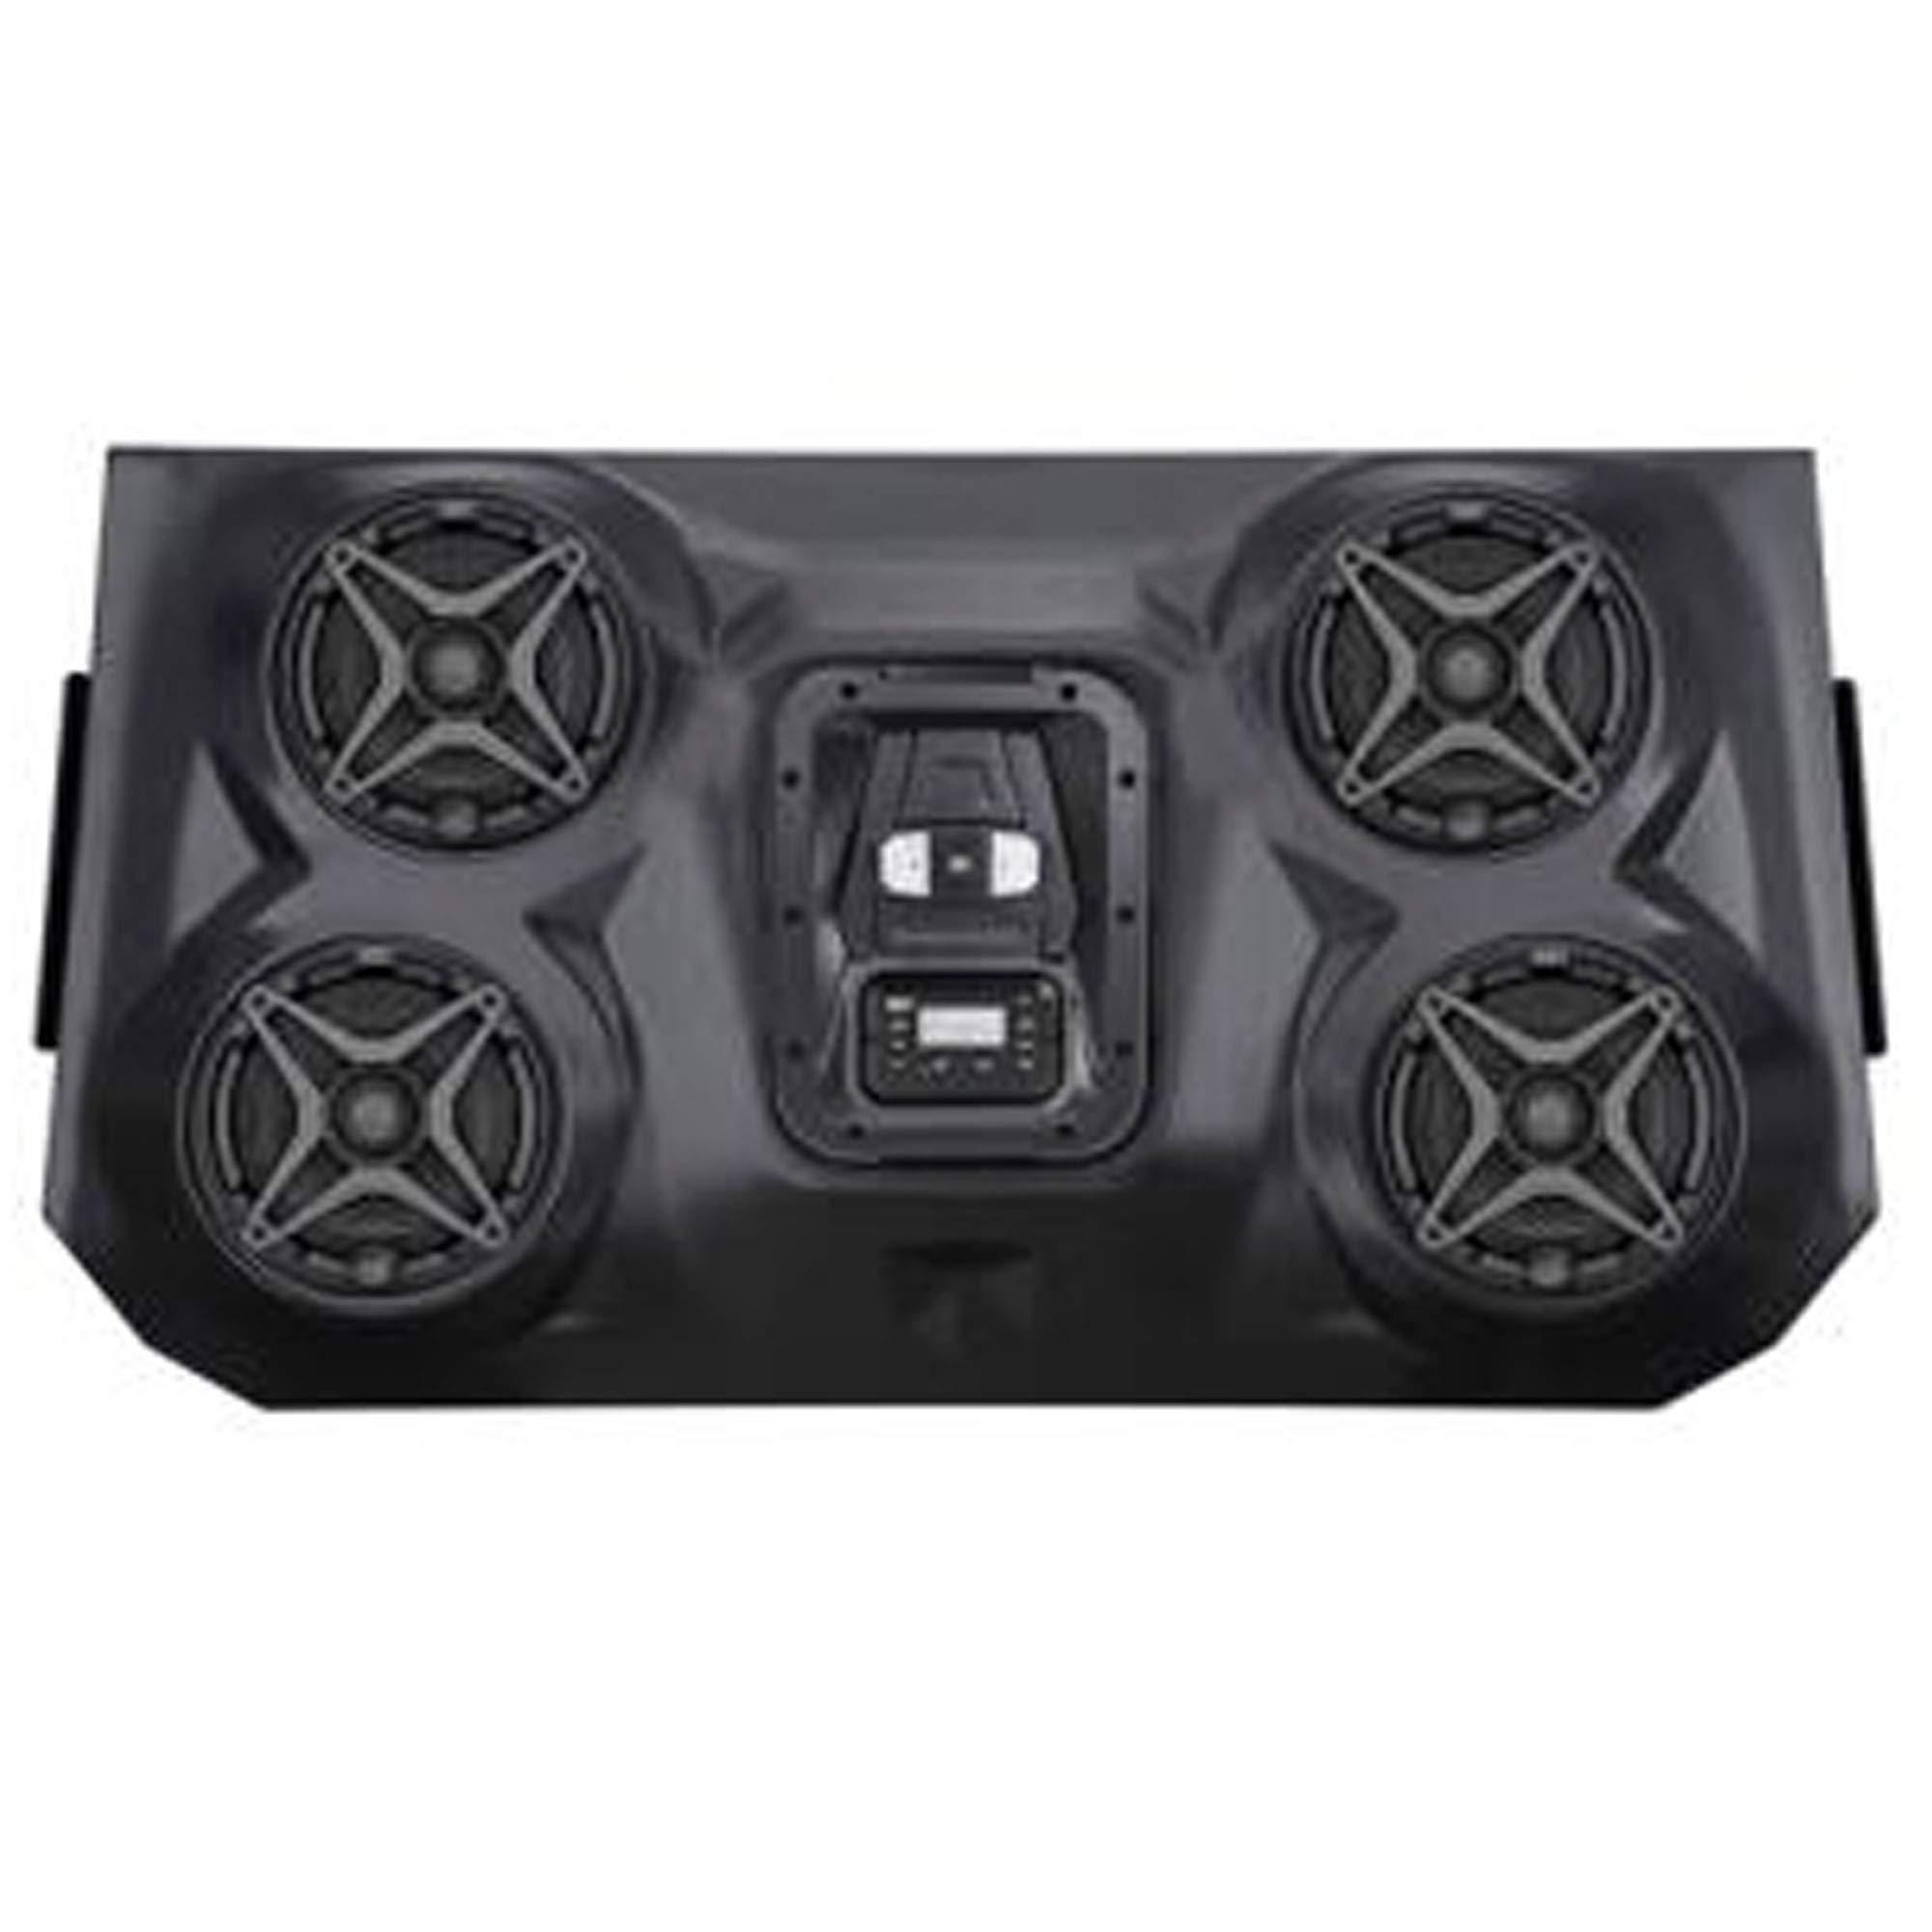 SSV Works WP3-RZF3O4A Weather Proof Razer 4 Overhead iPod 4 Speaker Sound bar with Bluetooth by SSV Works